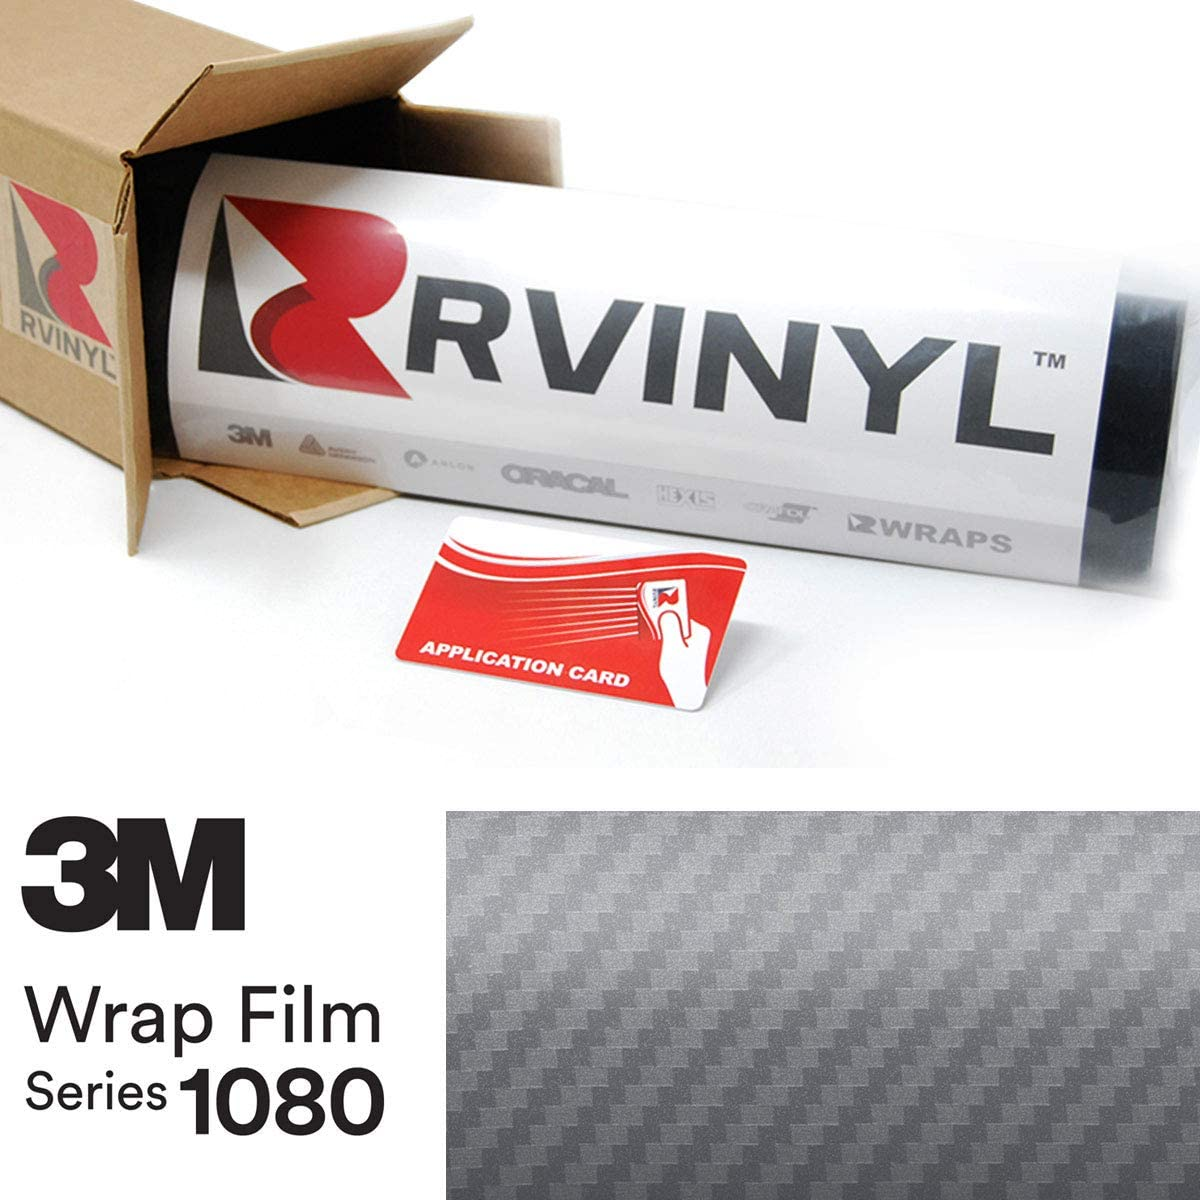 Car Wrap Vinyl Film 10 Sq//ft 3M 1080 CF12 BLACK CARBON FIBER 5ft x 2ft